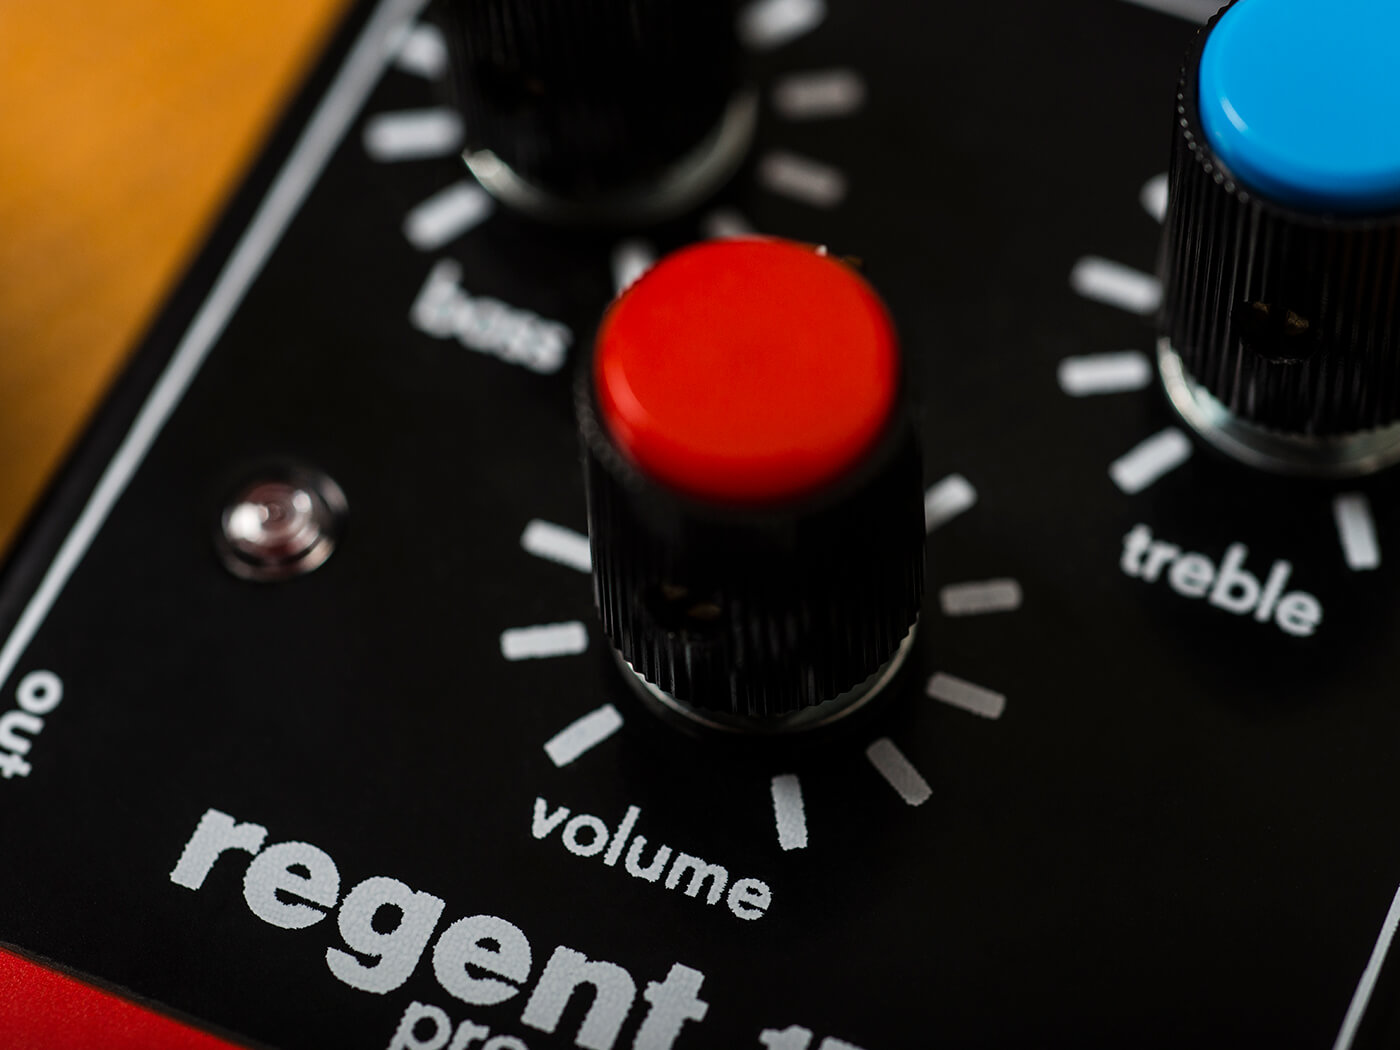 Fredric-Effects-Regent-150-Preamp-&-Verzerrer-Distortion